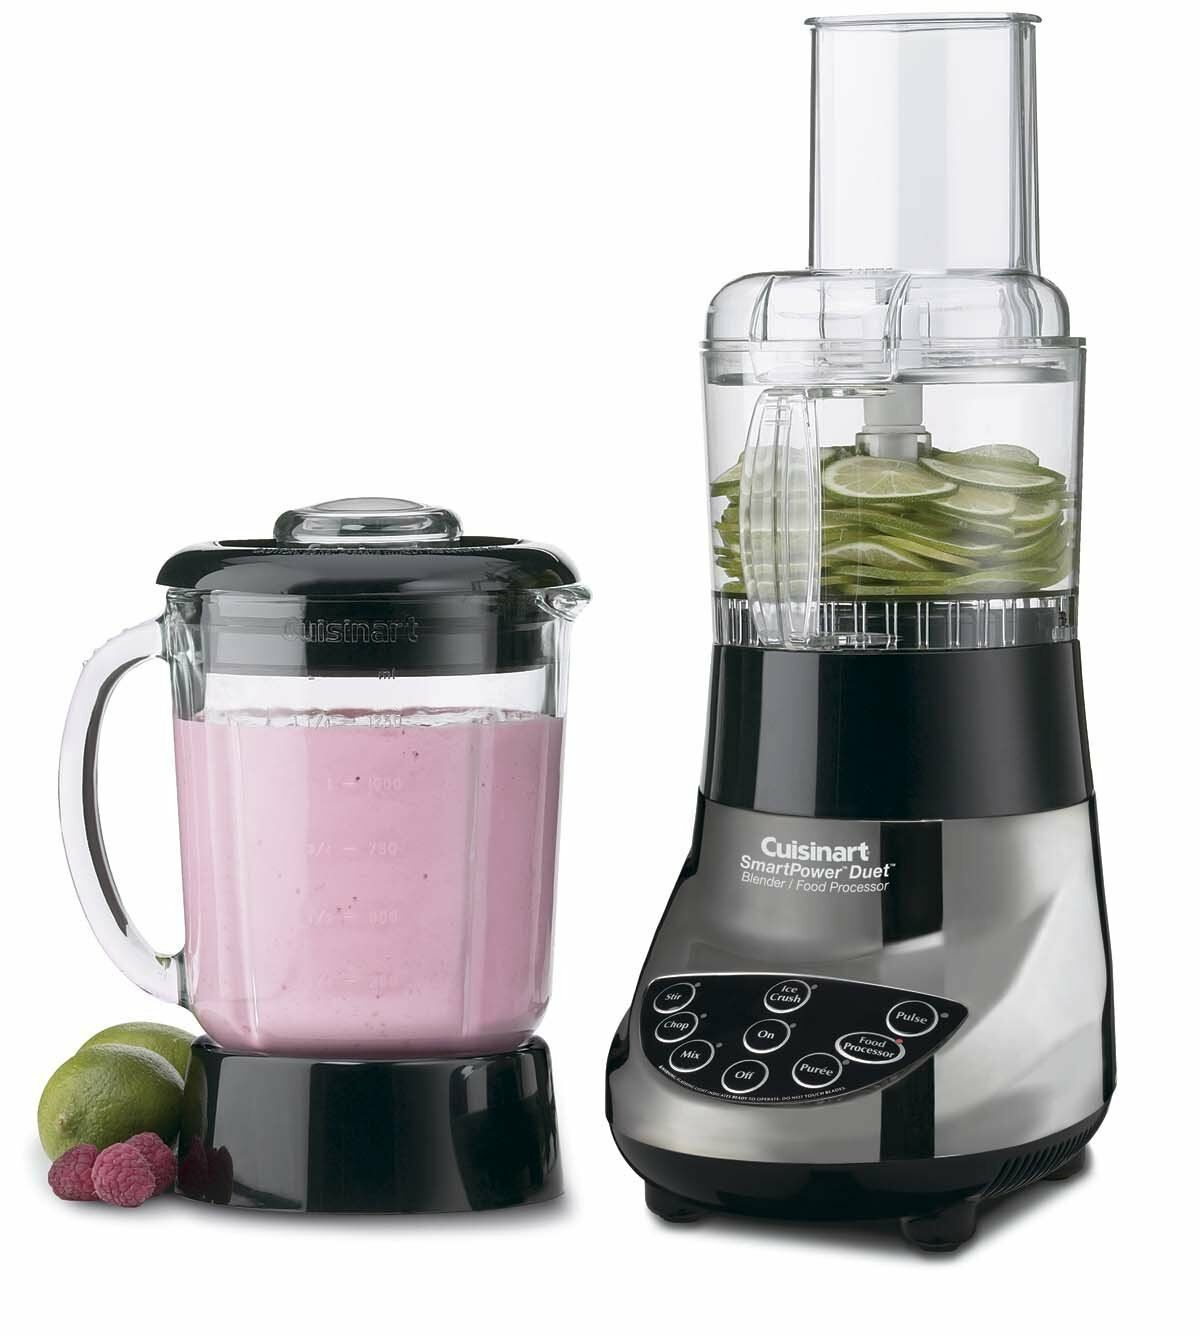 Cuisinart BFP-703BC SmartPower Duet Blender and Food Processor, Glass Jar Chrome